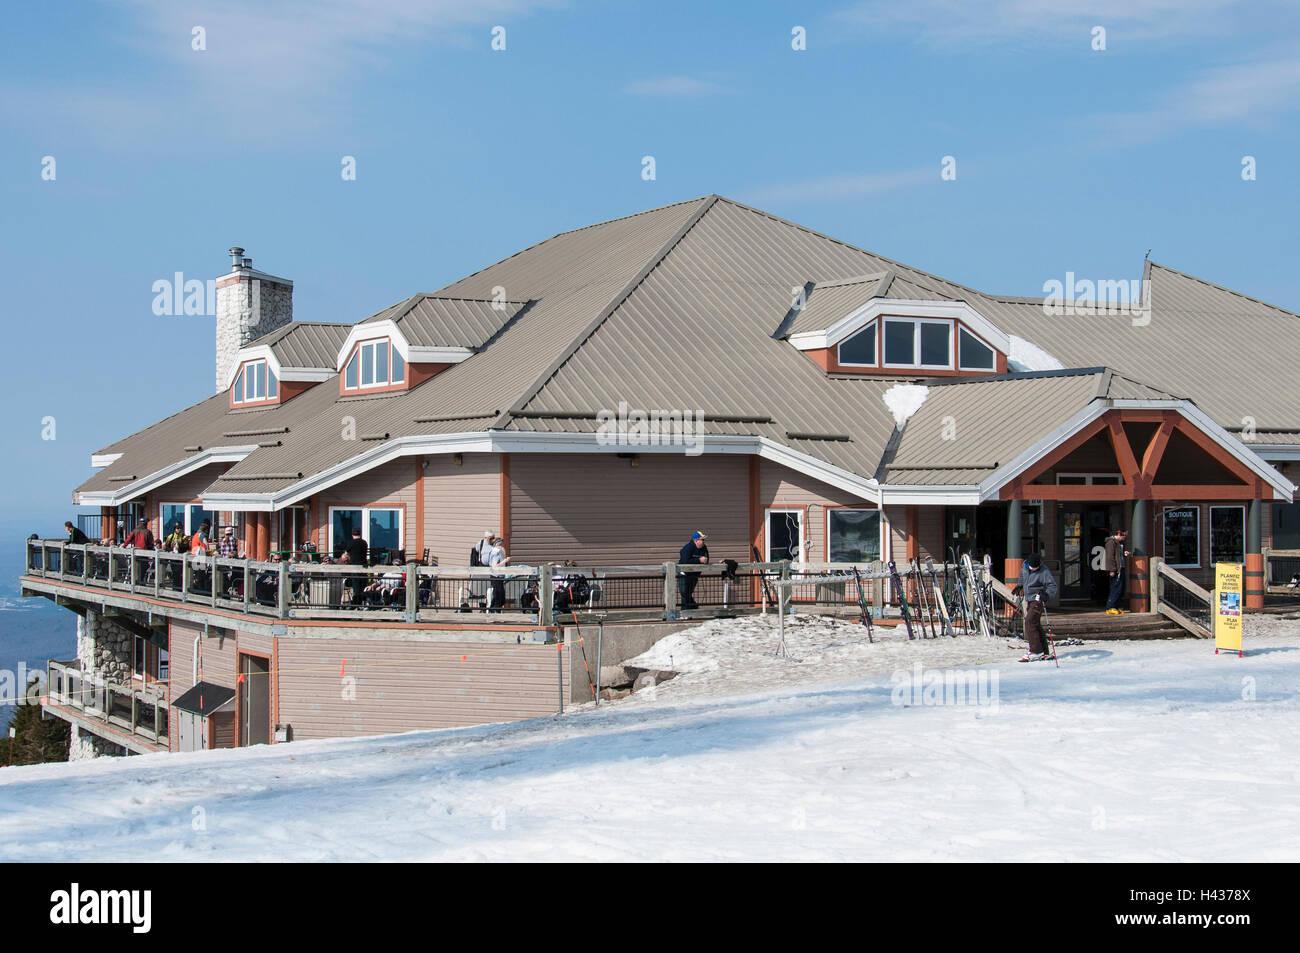 Le Grande Maitou atop Mont Tremblant Ski Area, Quebec, Canada. - Stock Image